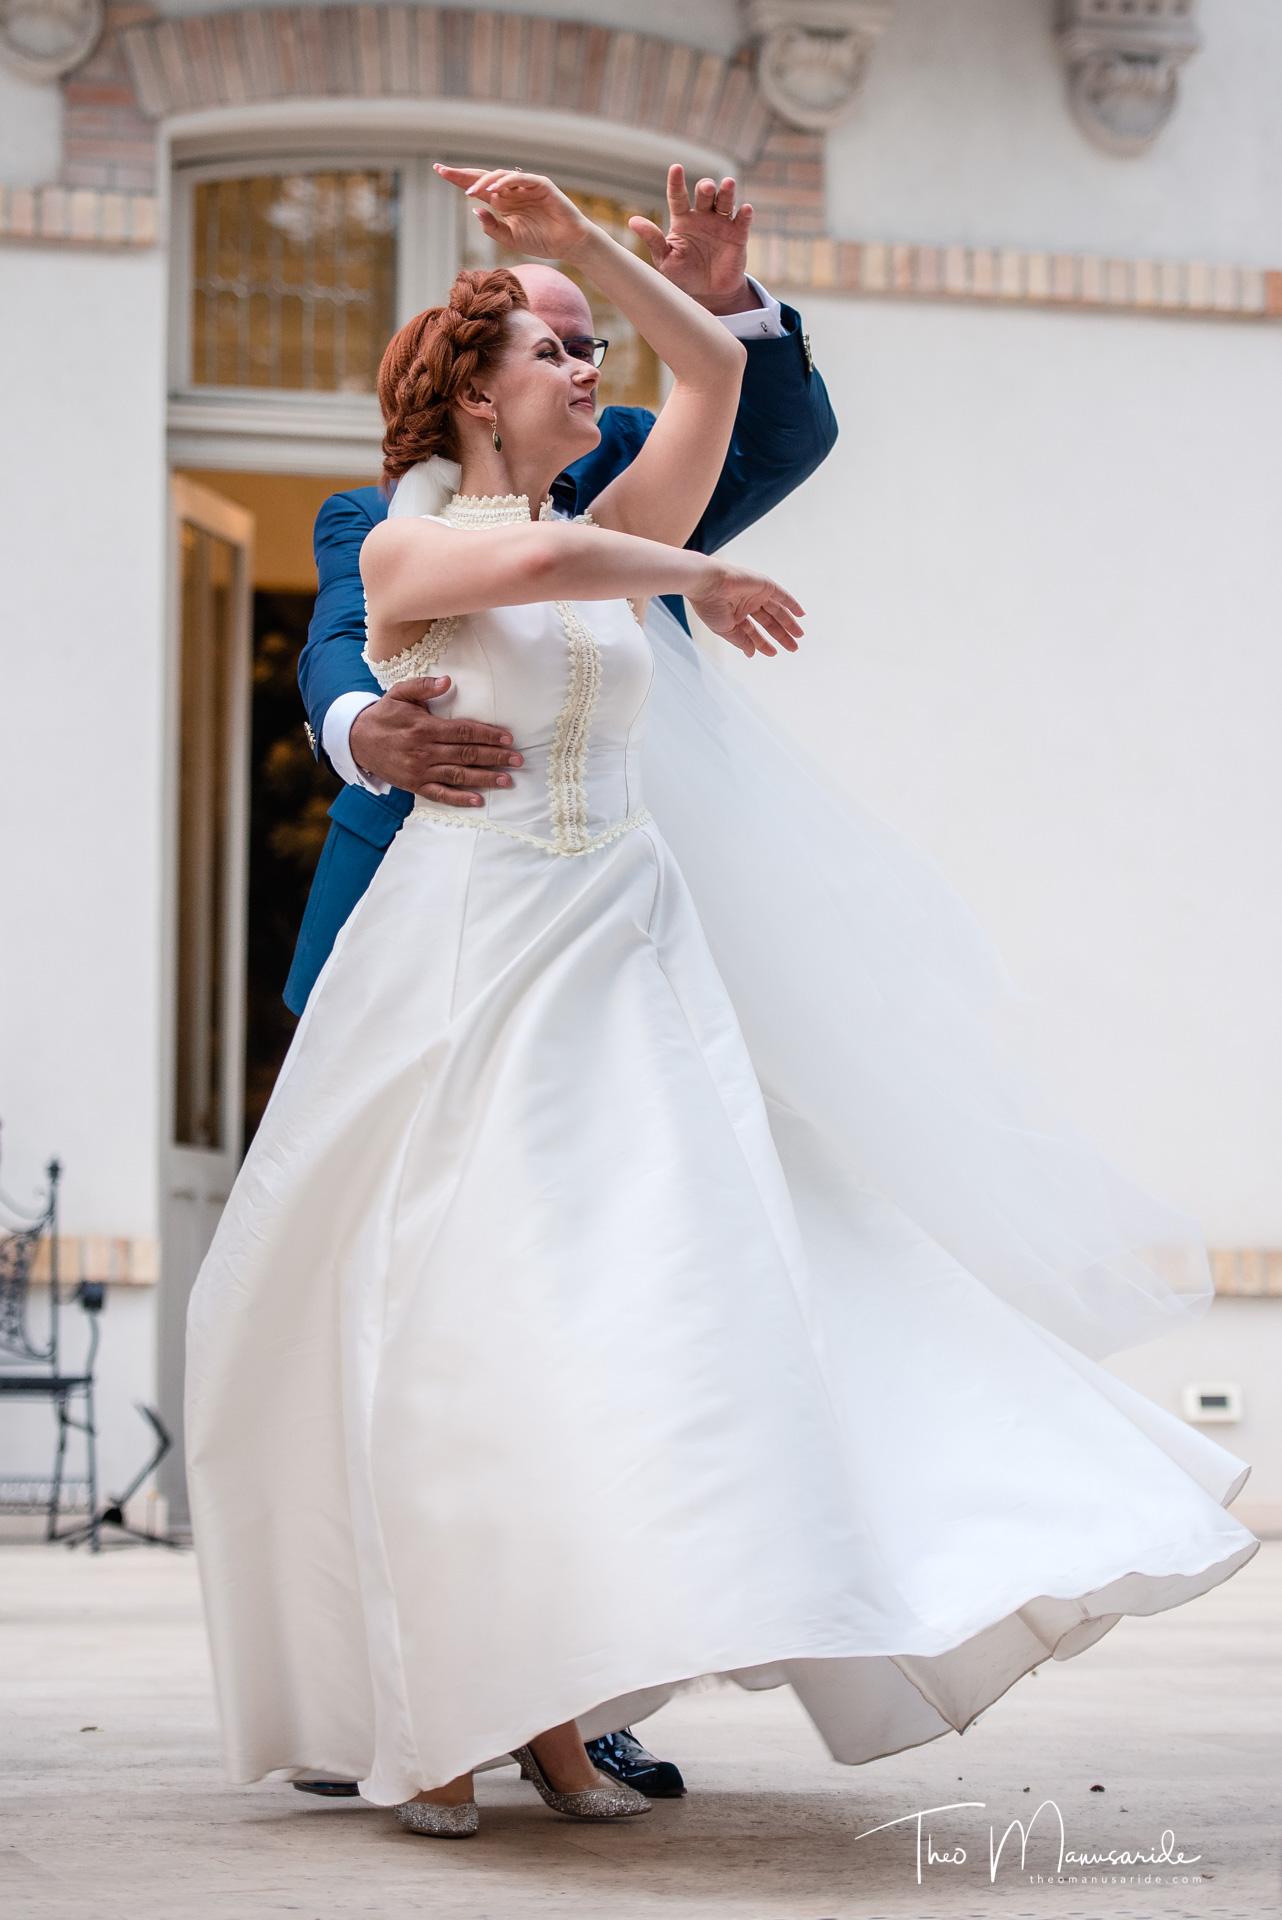 fotograf-nunta-domeniul-manasia-35